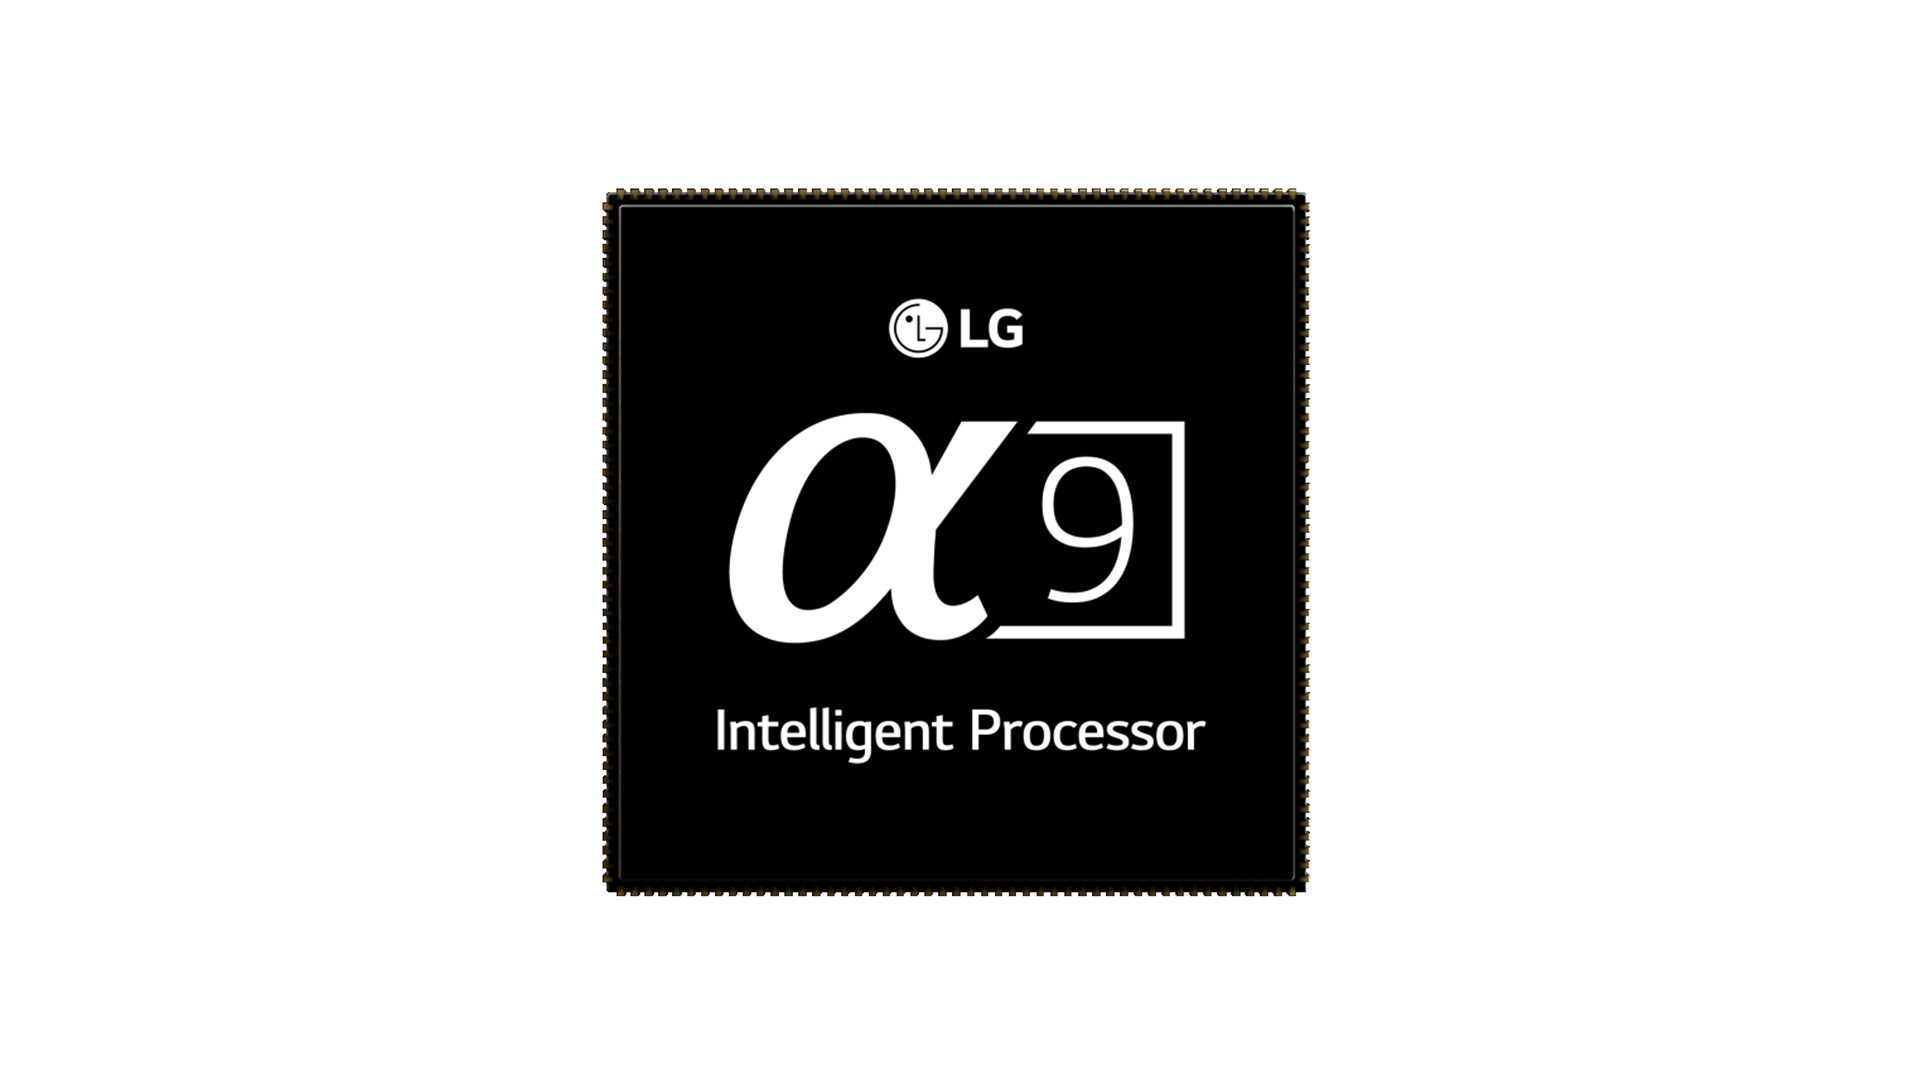 lg-alpha-9-intelligent-processor-1.jpg